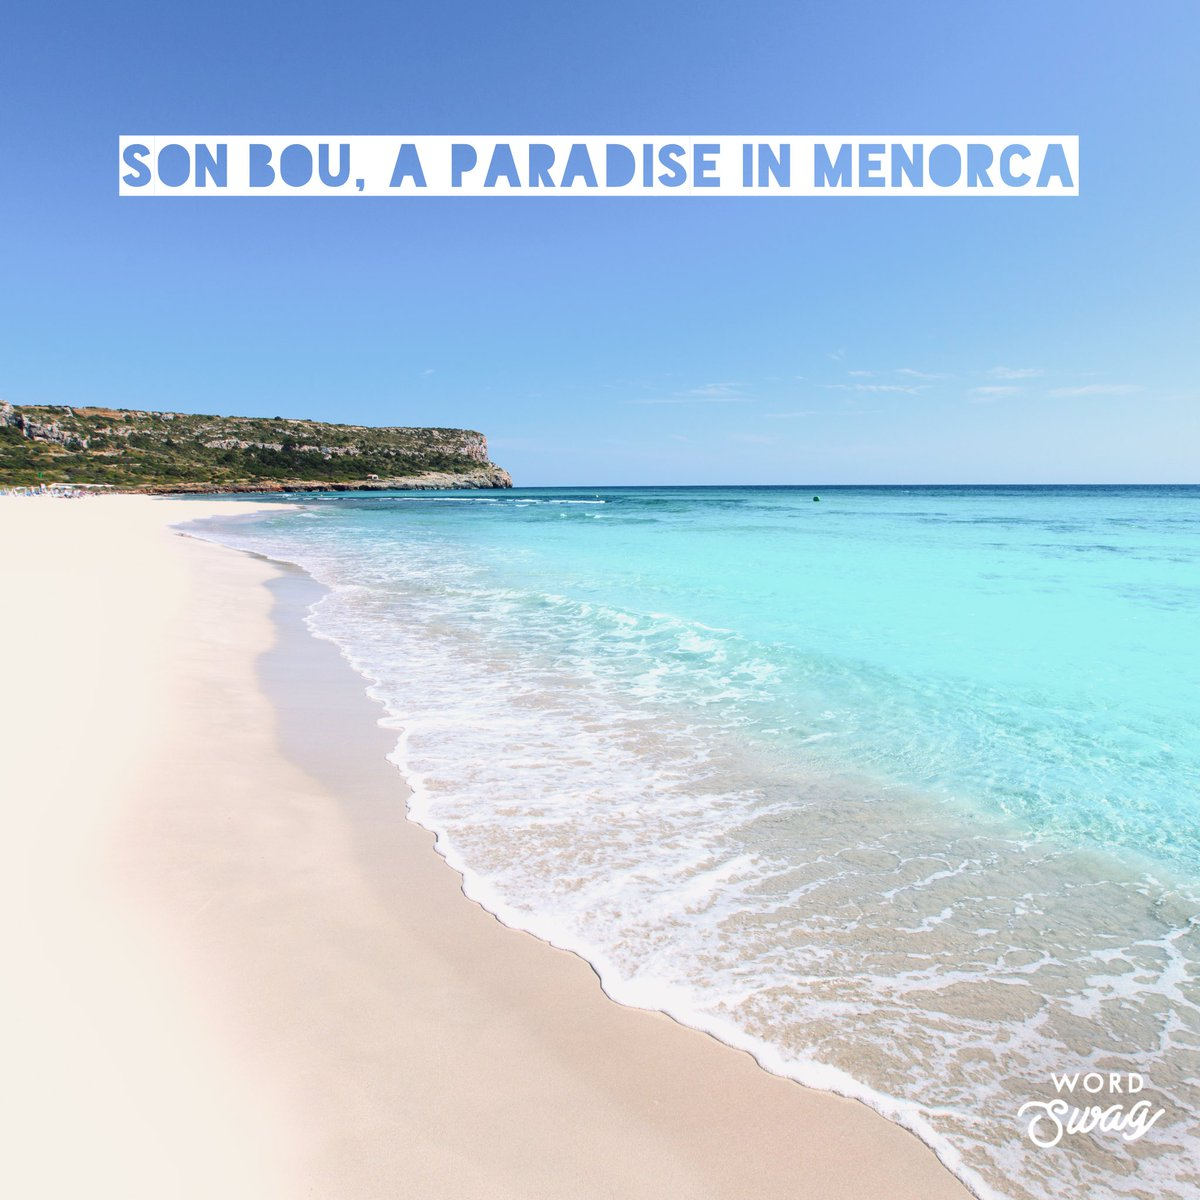 Son Bou, a paradise in Menorca #MenorcaVacations #MenorcaHolidays #MenorcaAllYear #MenorcaEveryDay #MenorcaDetails #MenorcaParadise #MenorcaLove #MenorcaLife #EnjoyMenorca #Balearics #BalearicIslands #MenorcaSonBou #MenorcaViews #VisitMenorca #TurismoMenorca #Menorca #MenorcaSlowpic.twitter.com/ZQ9AVP74Yn